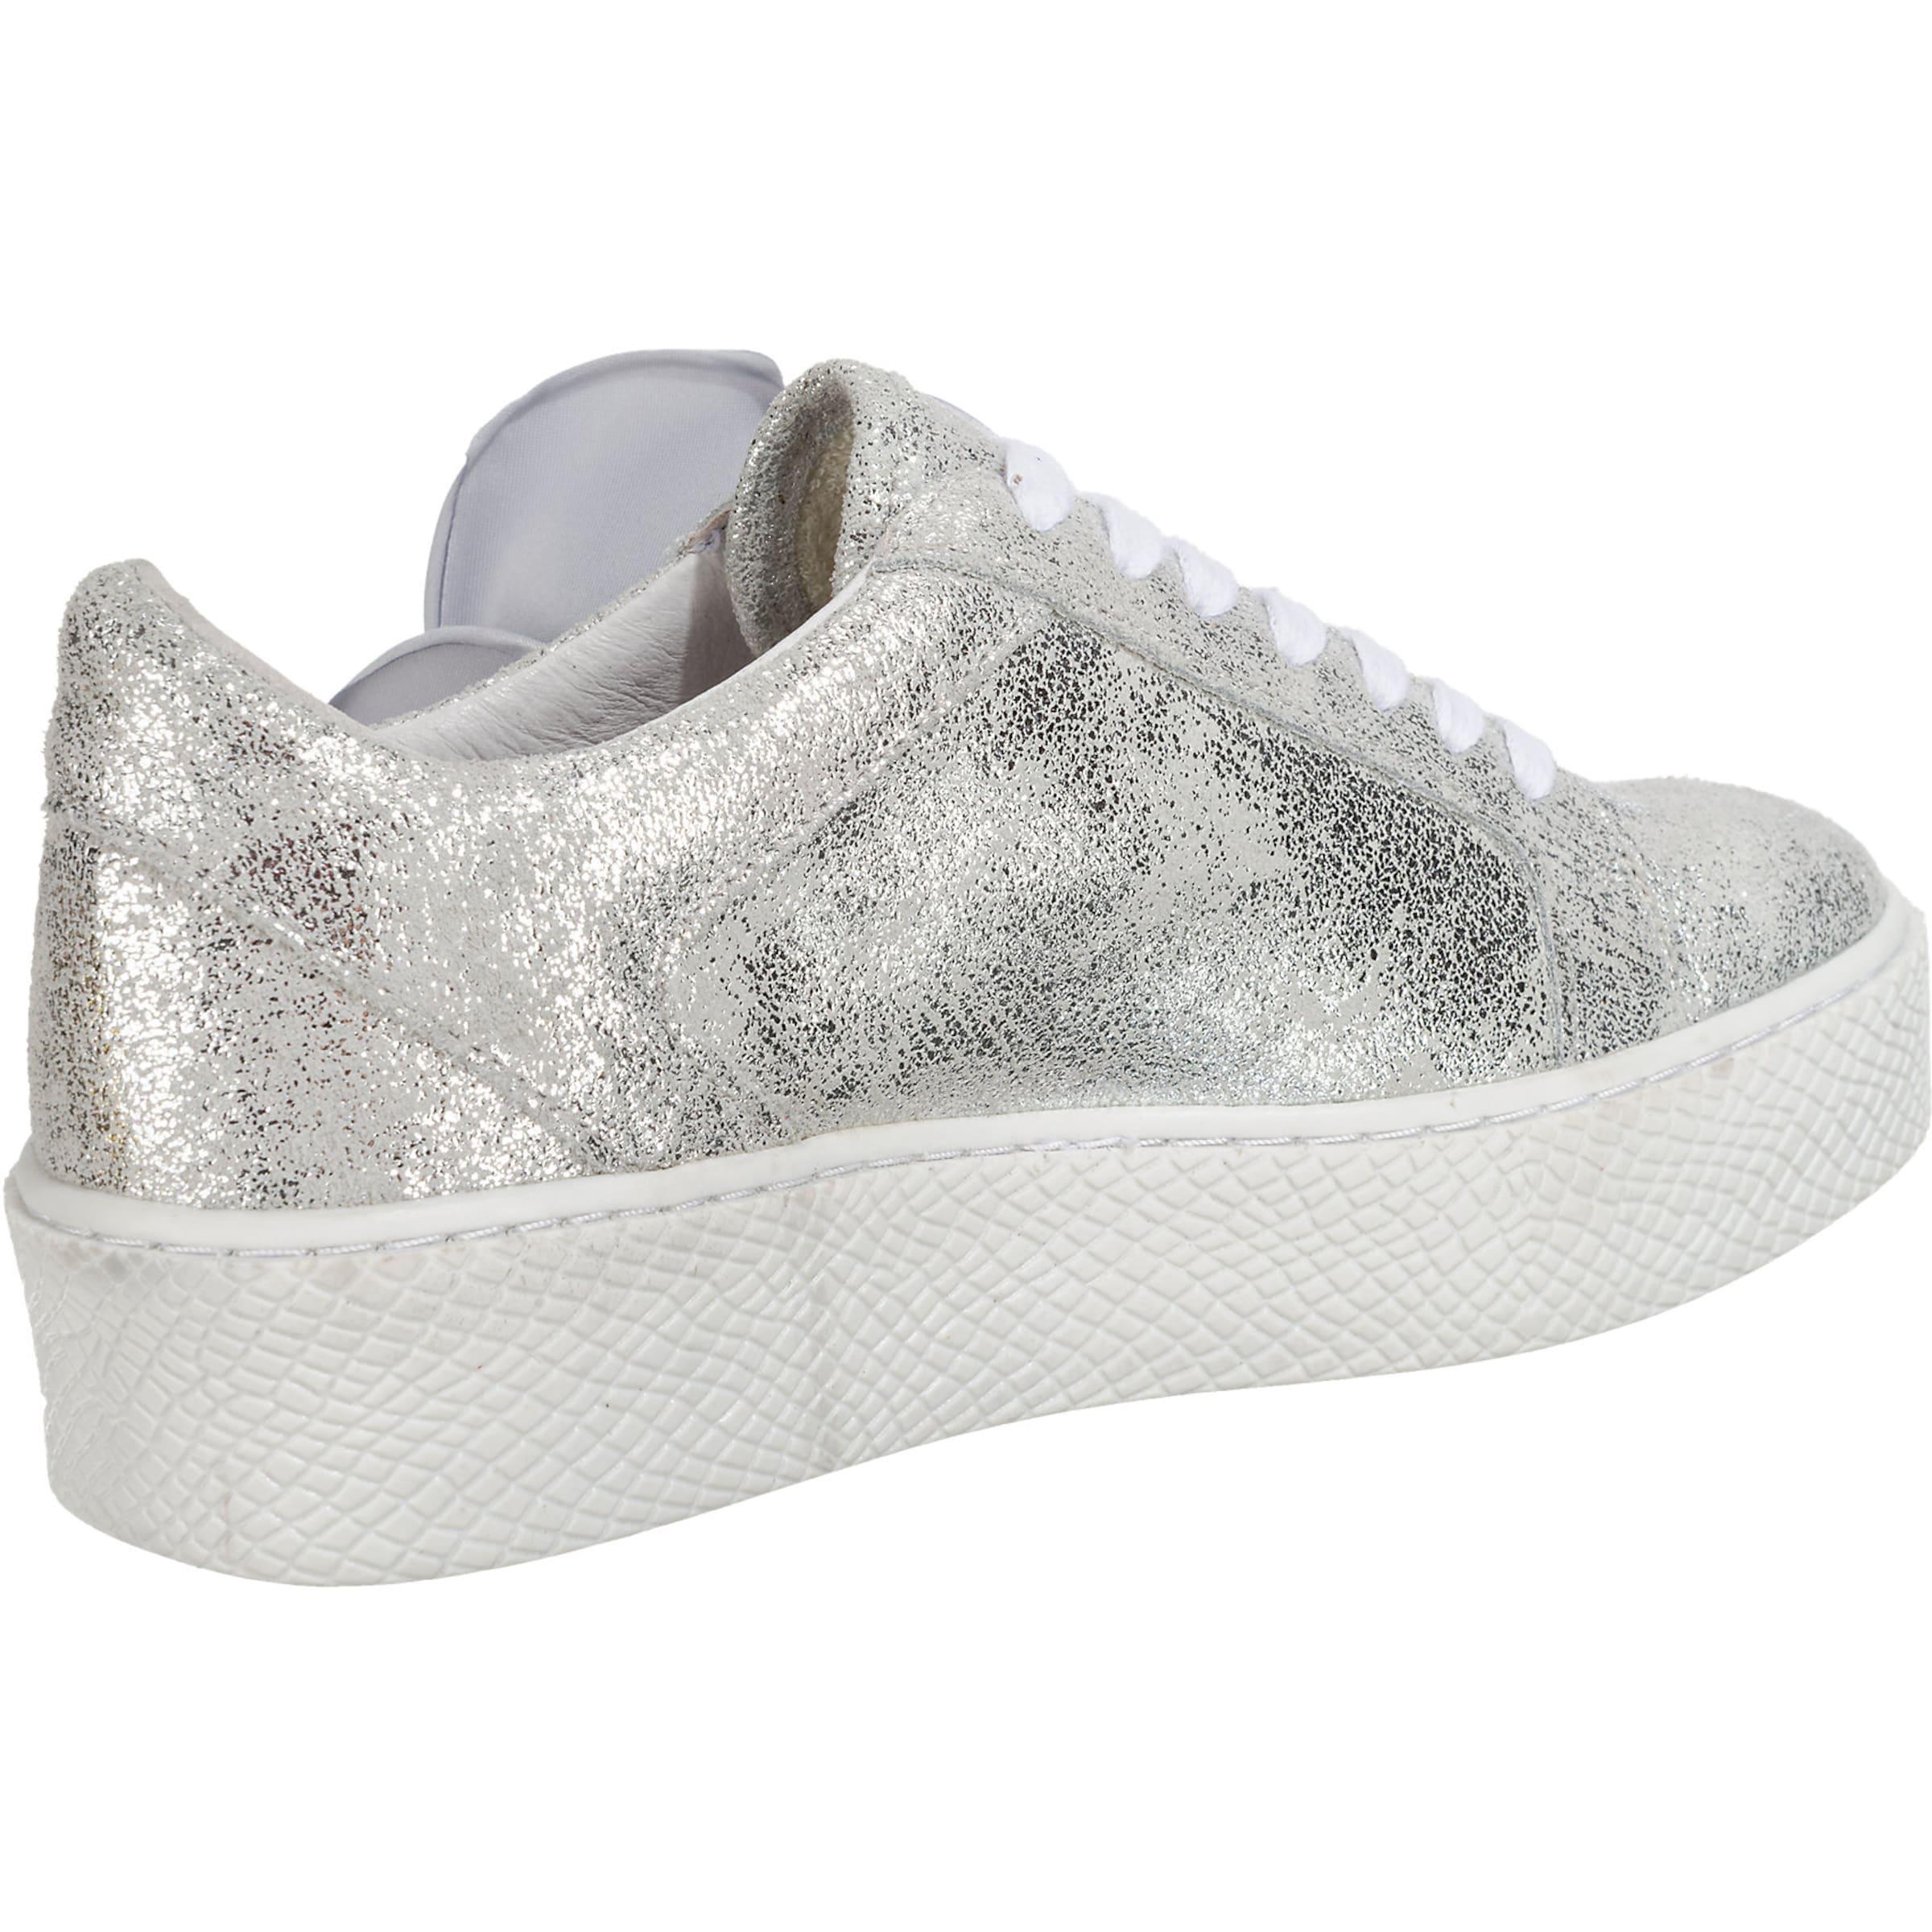 SPM Mellie SPM Sneaker Sneakers Mellie Low PEpwxqPr